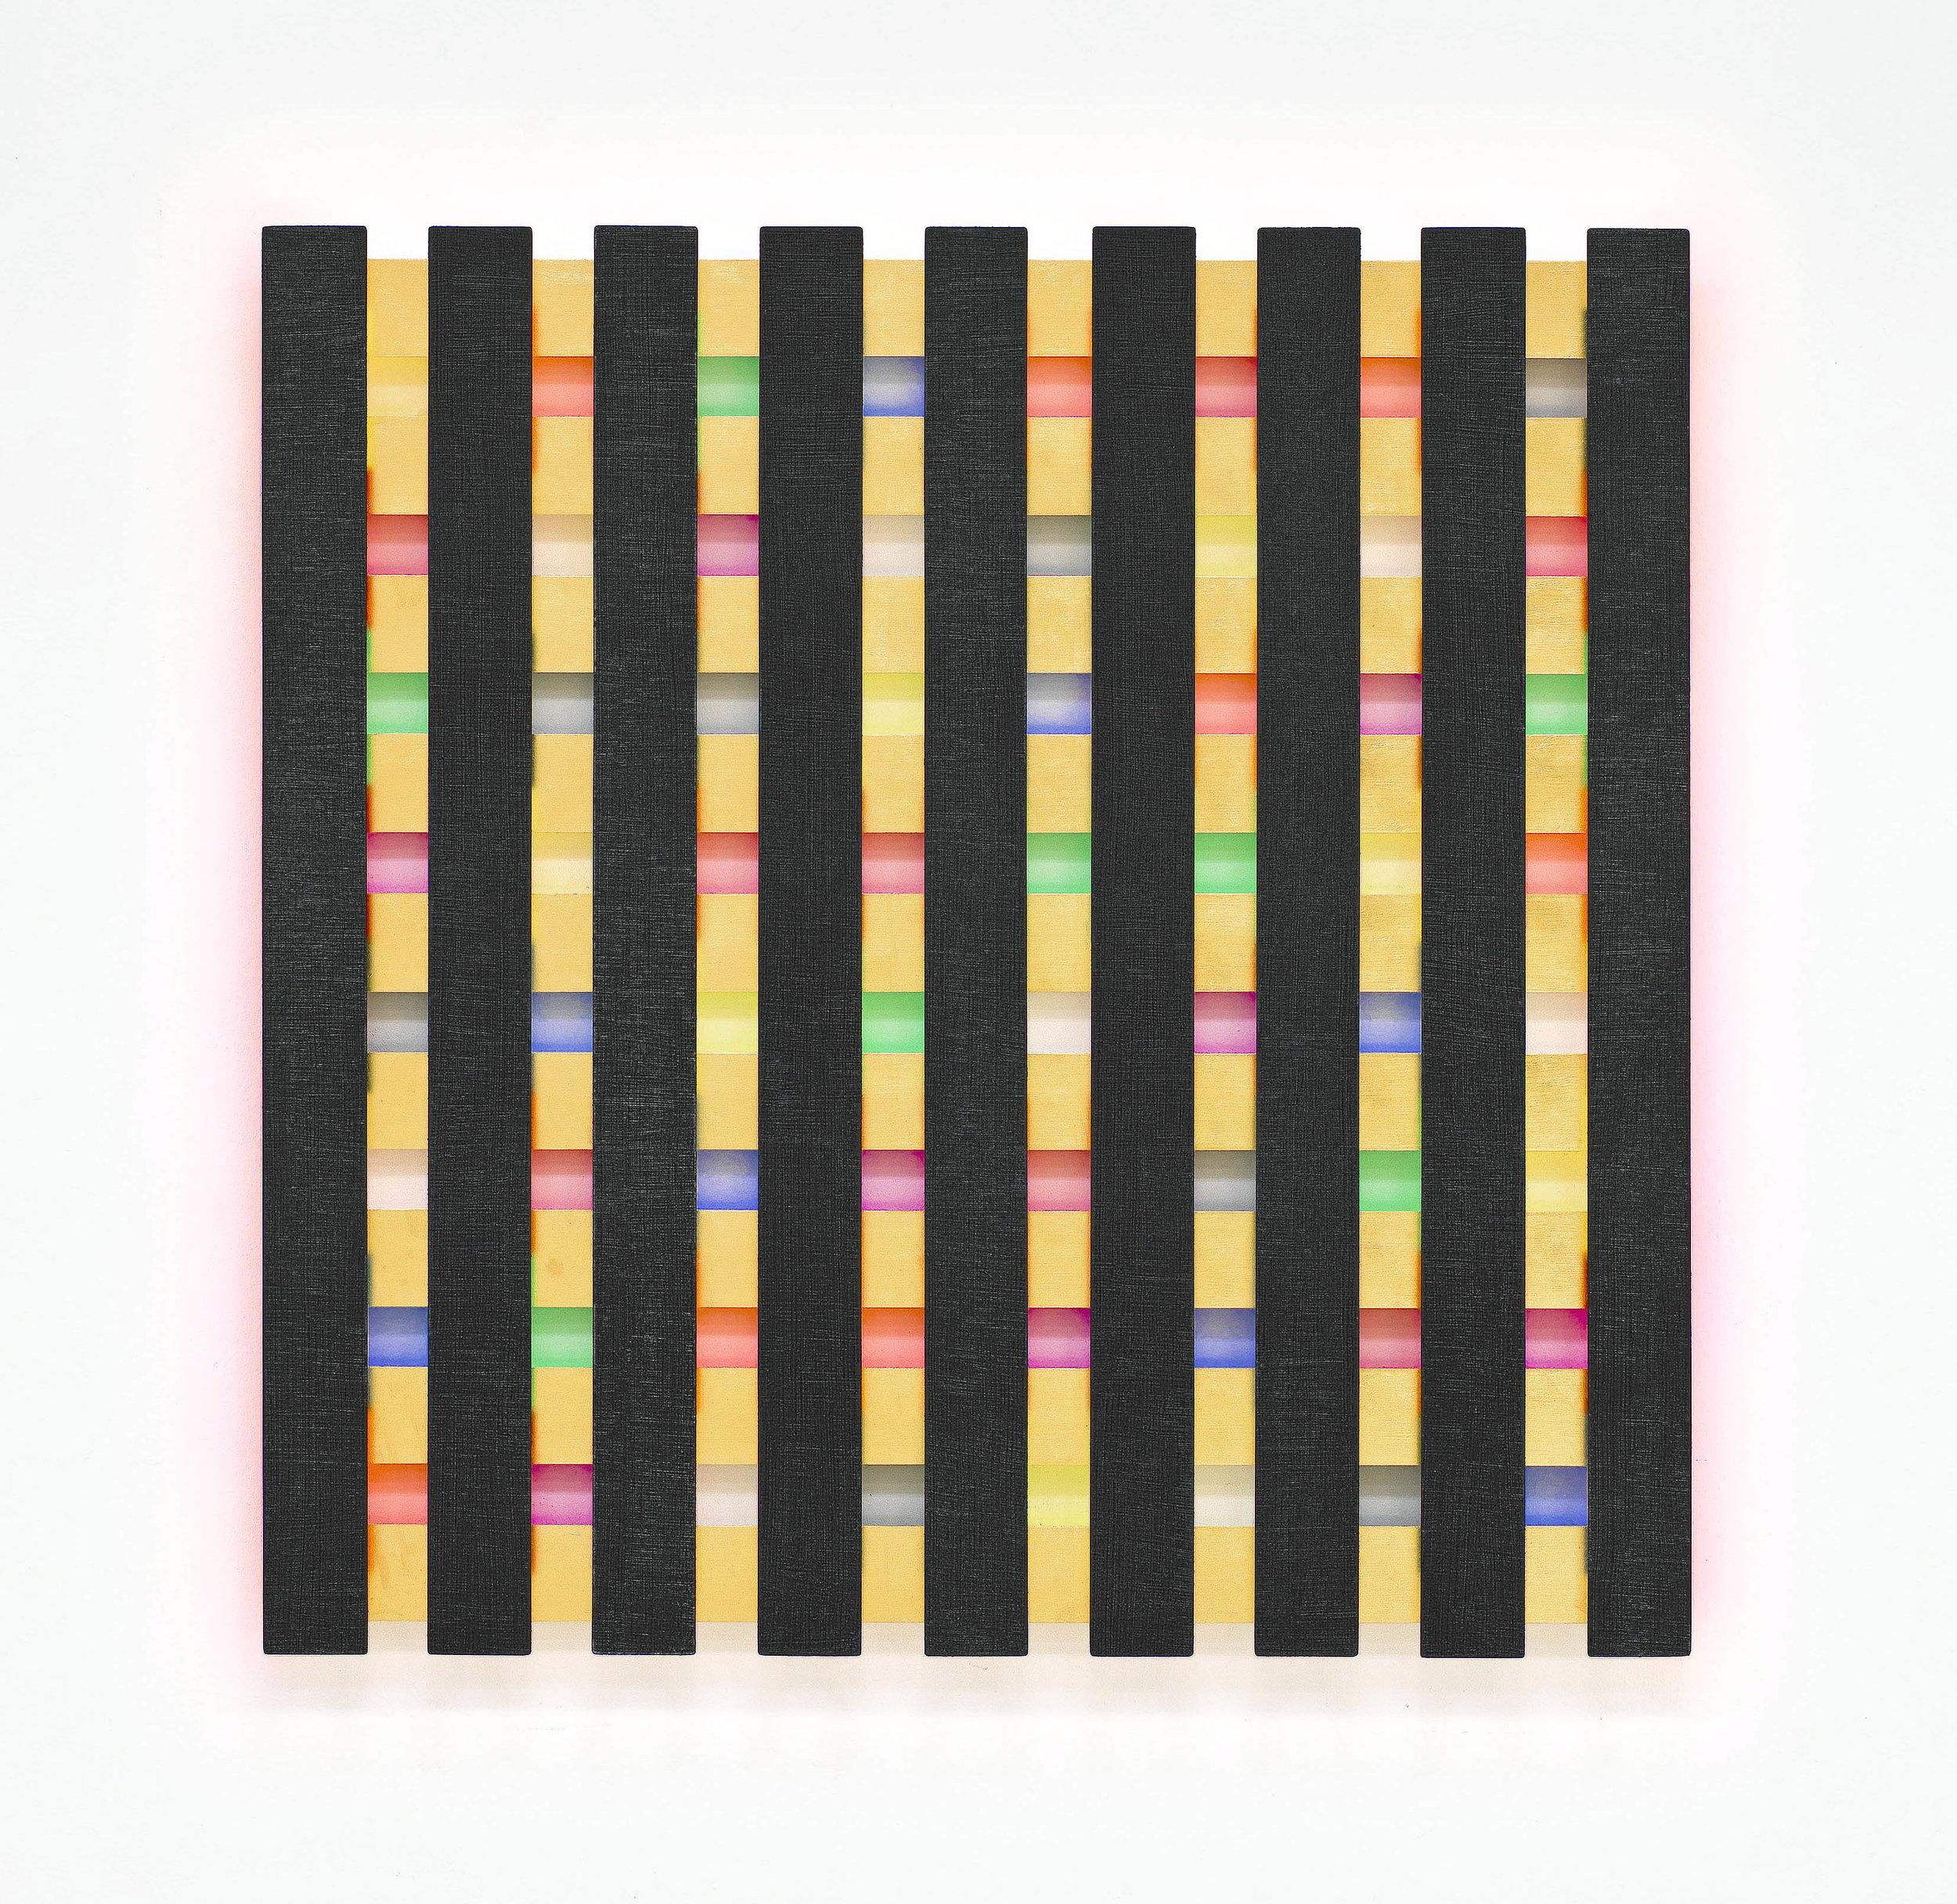 2i akril, les, 121 x 121 cm, 2009.jpg